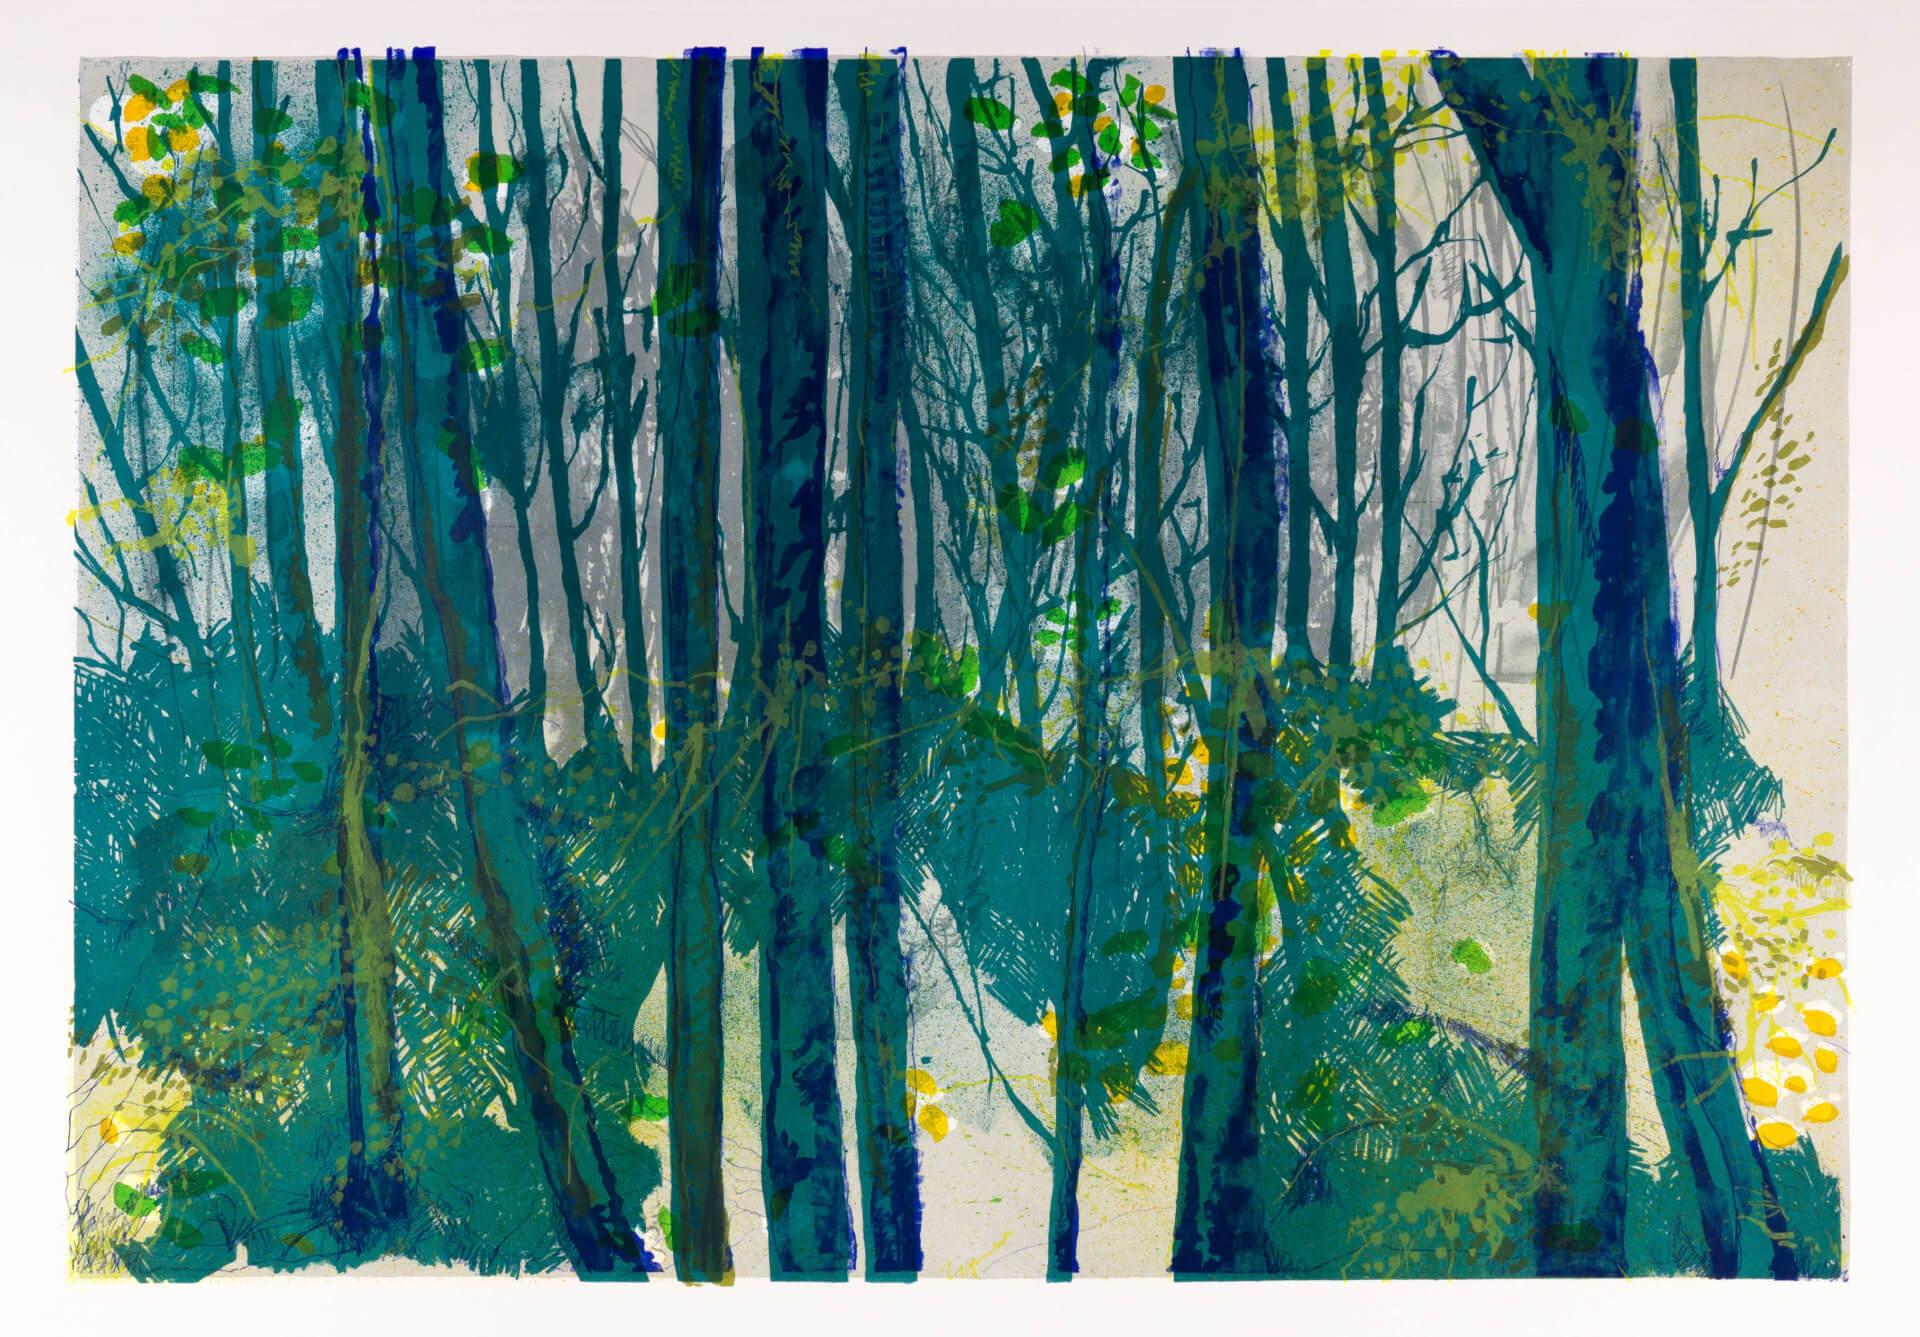 Katharina Albers, Wald XV, 2014, Farblithographie, 2 Auflagen, 64×92 cm